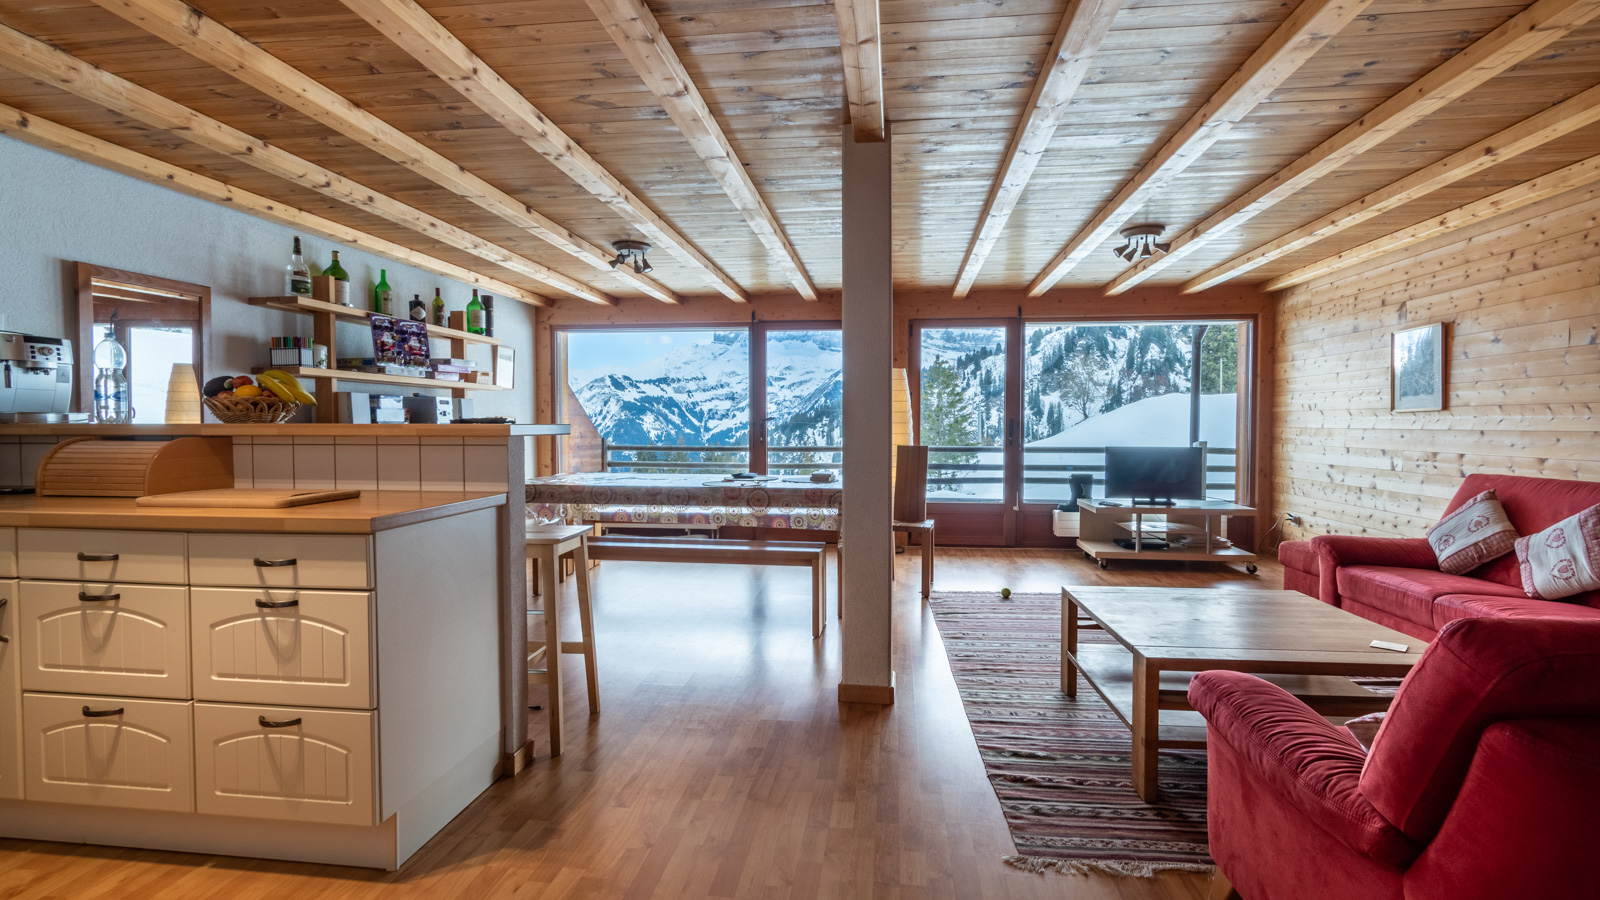 Le Midi Apartments, Switzerland